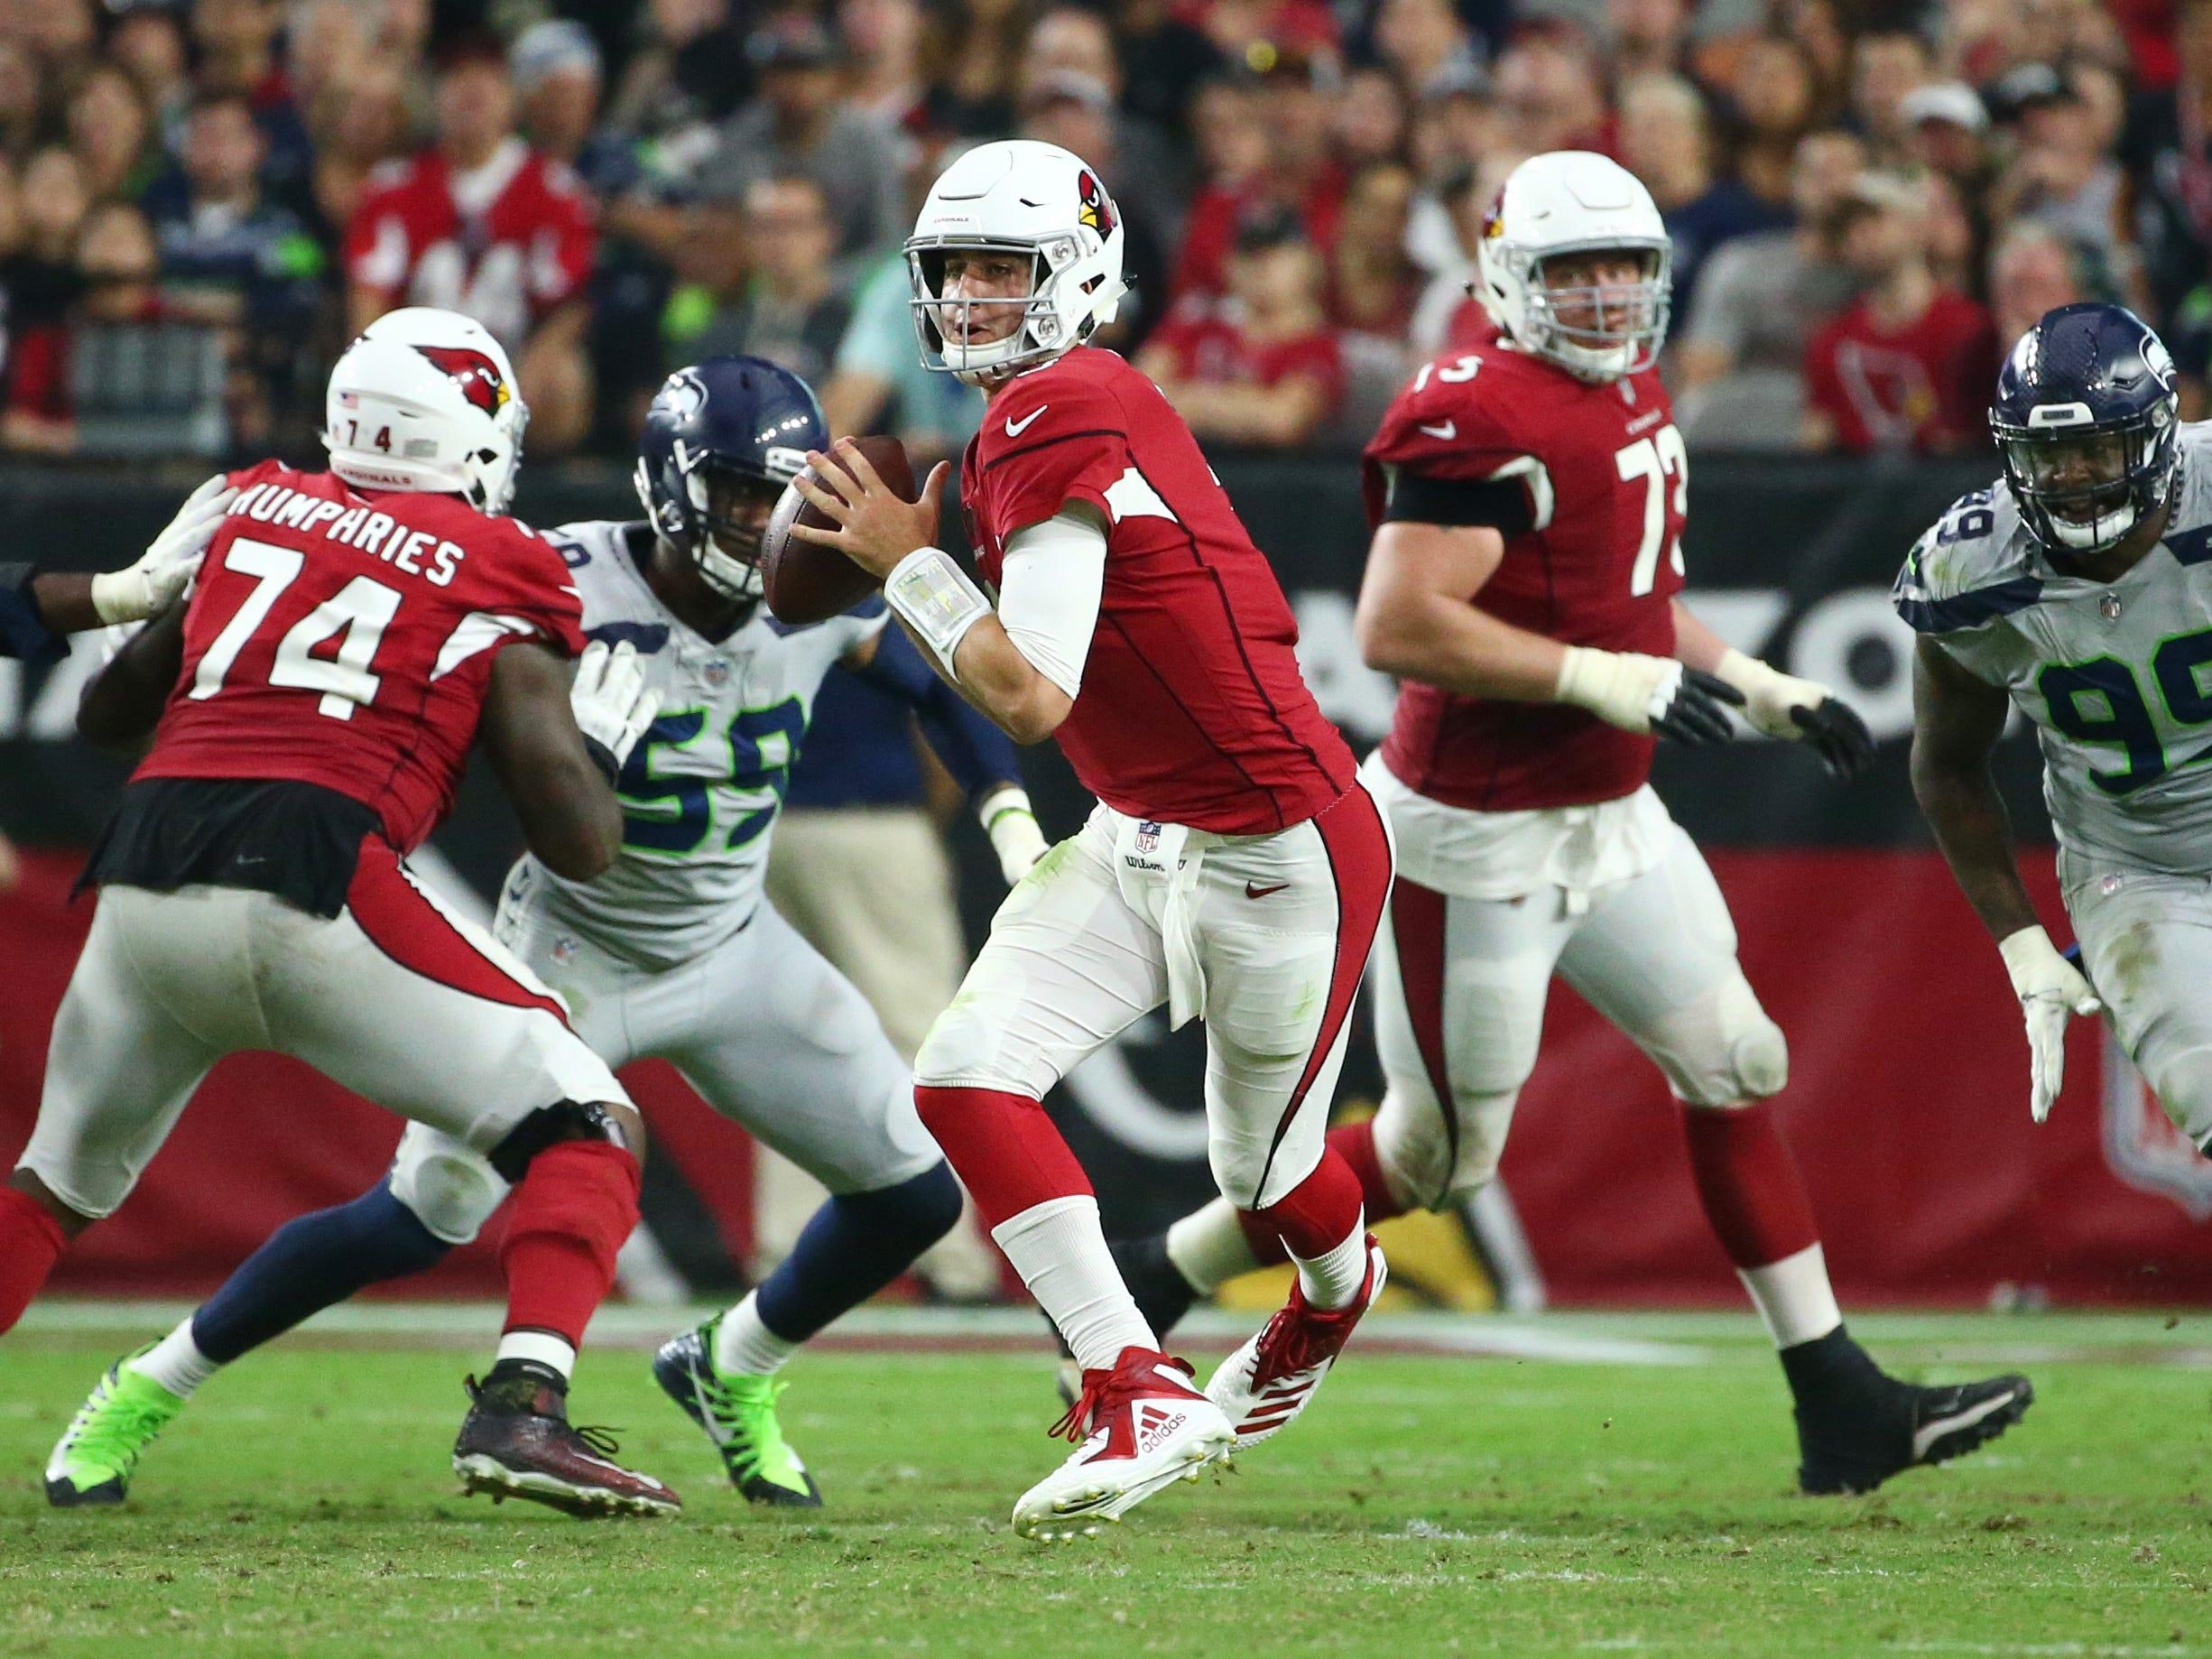 Arizona Cardinals quarterback Josh Rosin looks to throw against the Seattle Seahawks in the second half at State Farm Stadium in Glendale, Ariz.